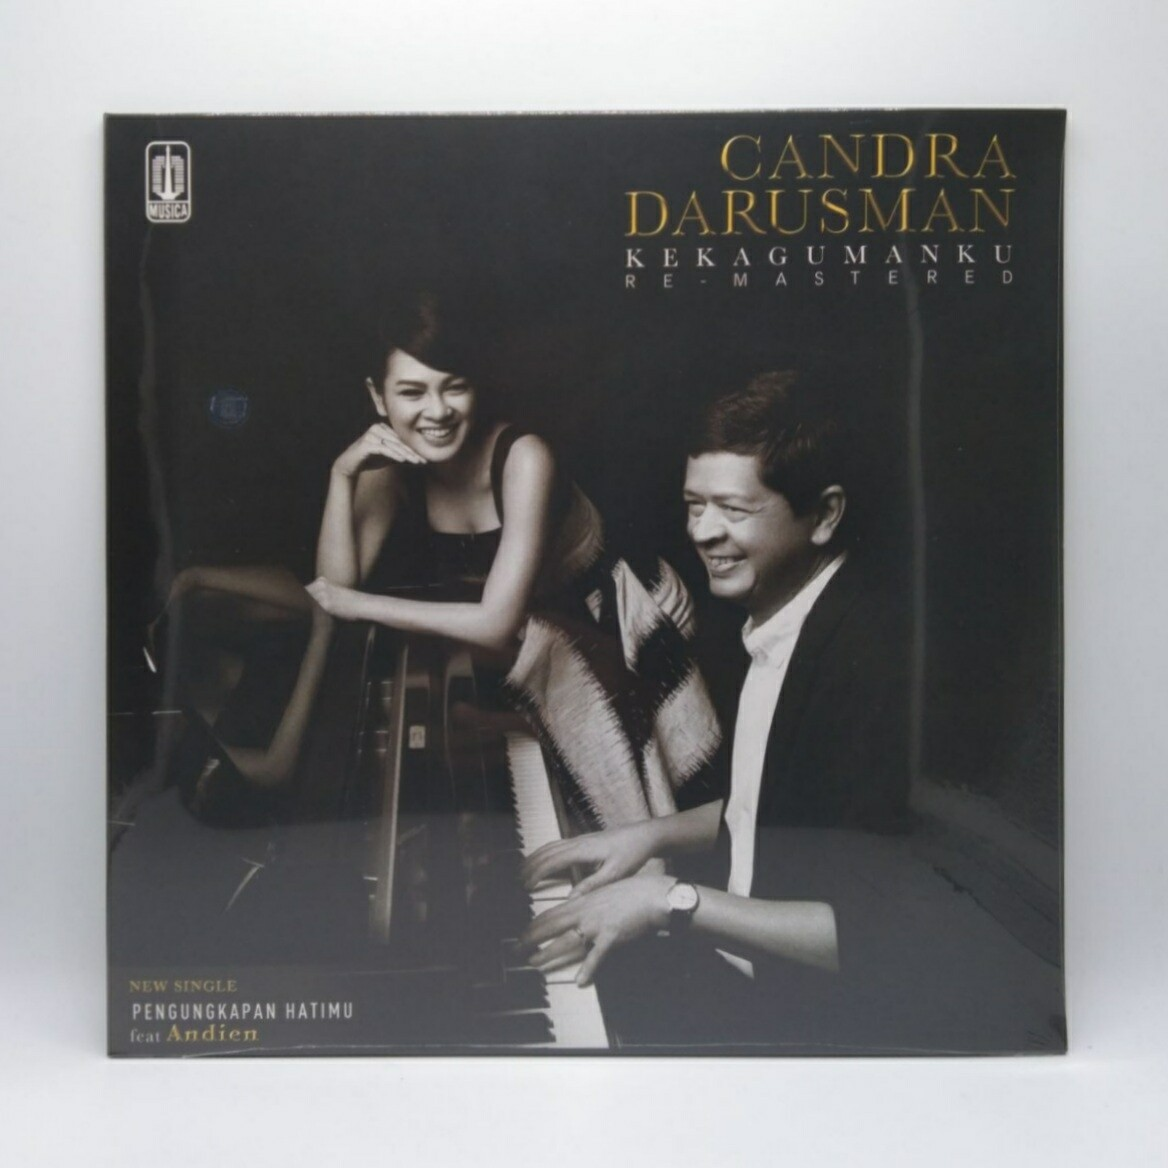 CANDRA DARUSMAN -KEKAGUMANKU: REMASTERED- LP